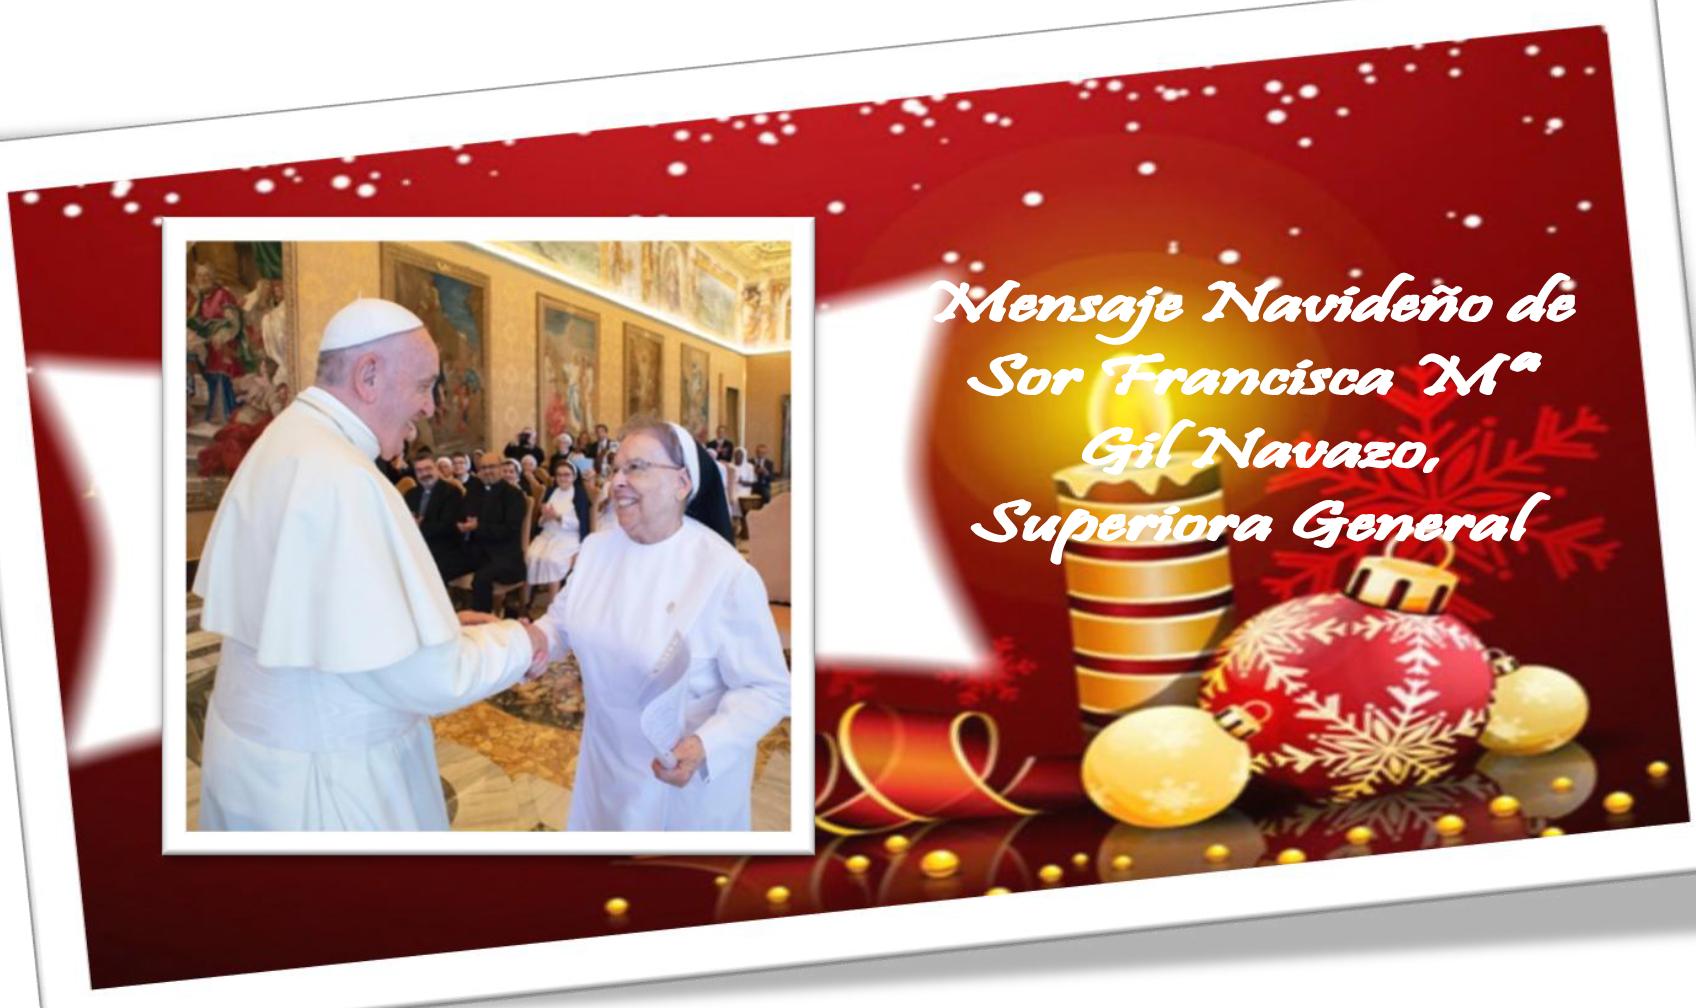 Mensaje navideño de Sor Francisca Mª Gil Navarro, Superiora General Teatina